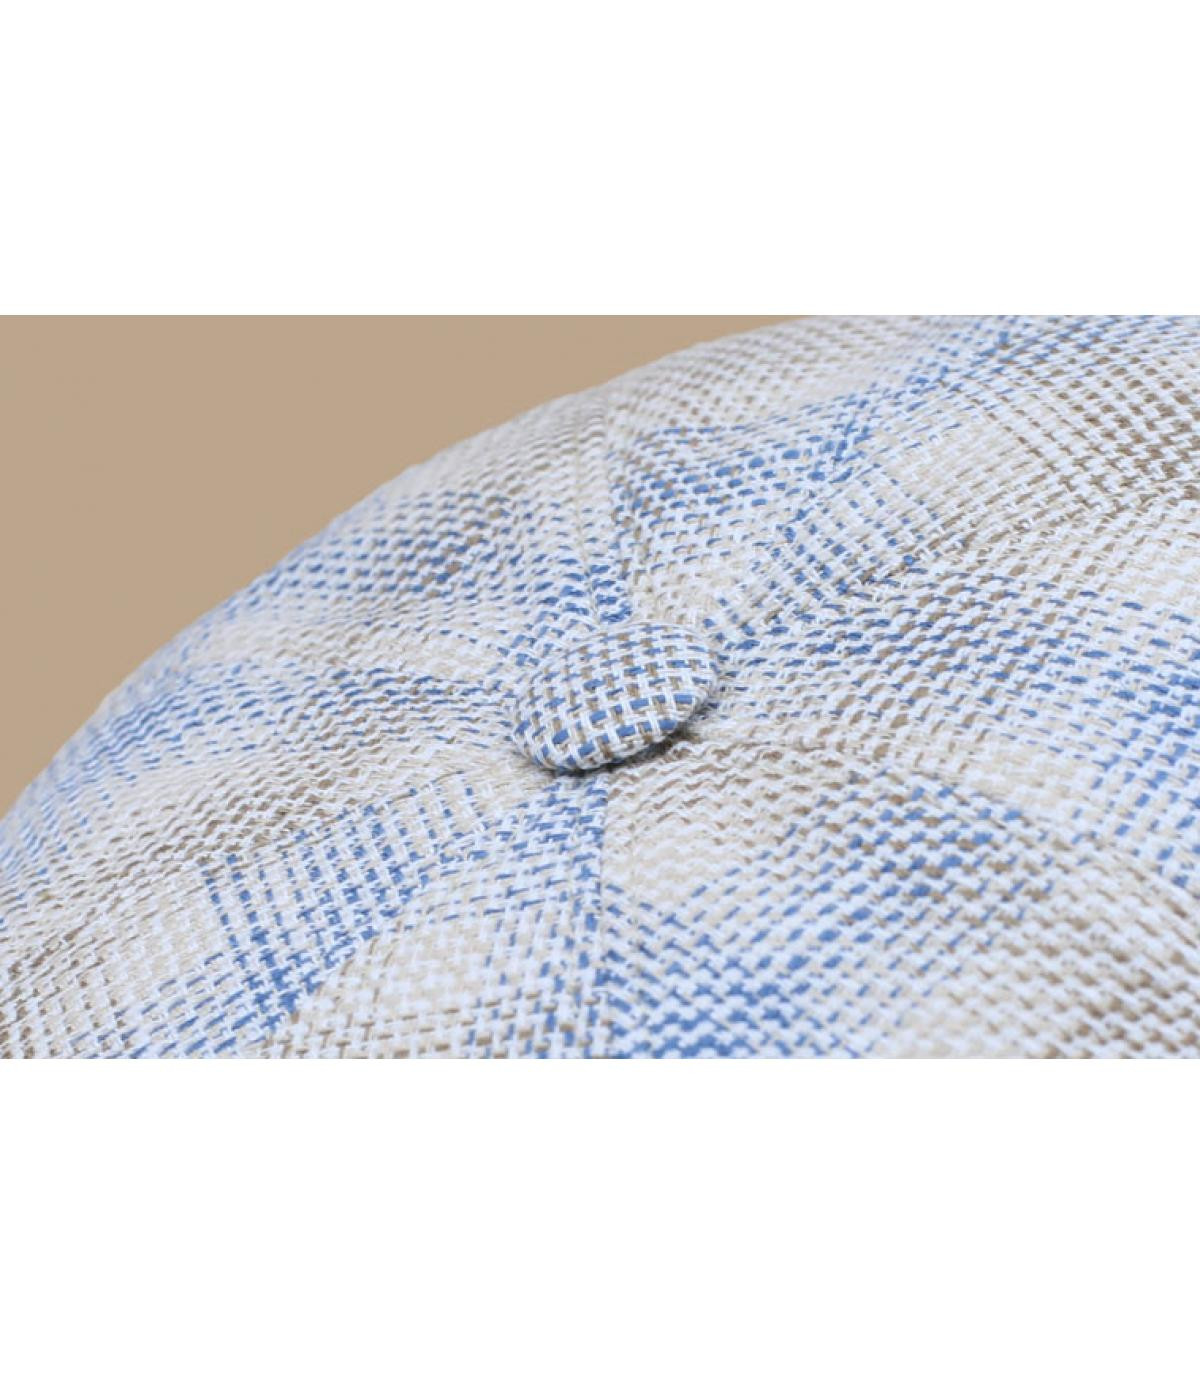 Detalles Staffy Cohiba beige blue imagen 3